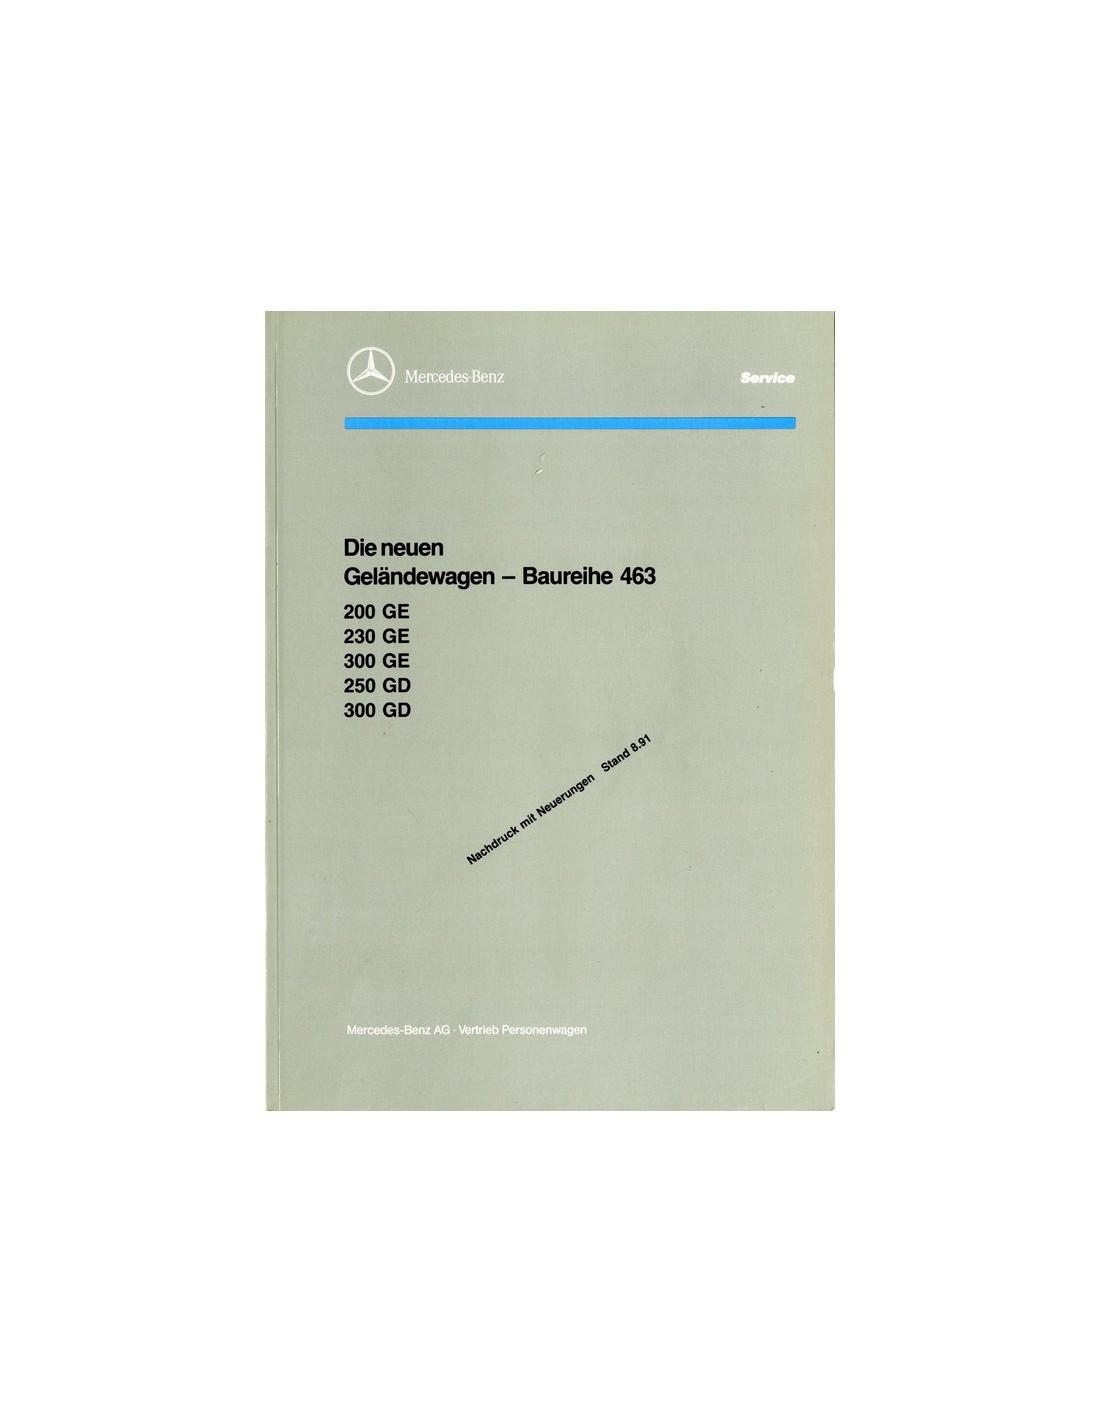 1991 mercedes benz g class w463 service manual german for Mercedes benz service g